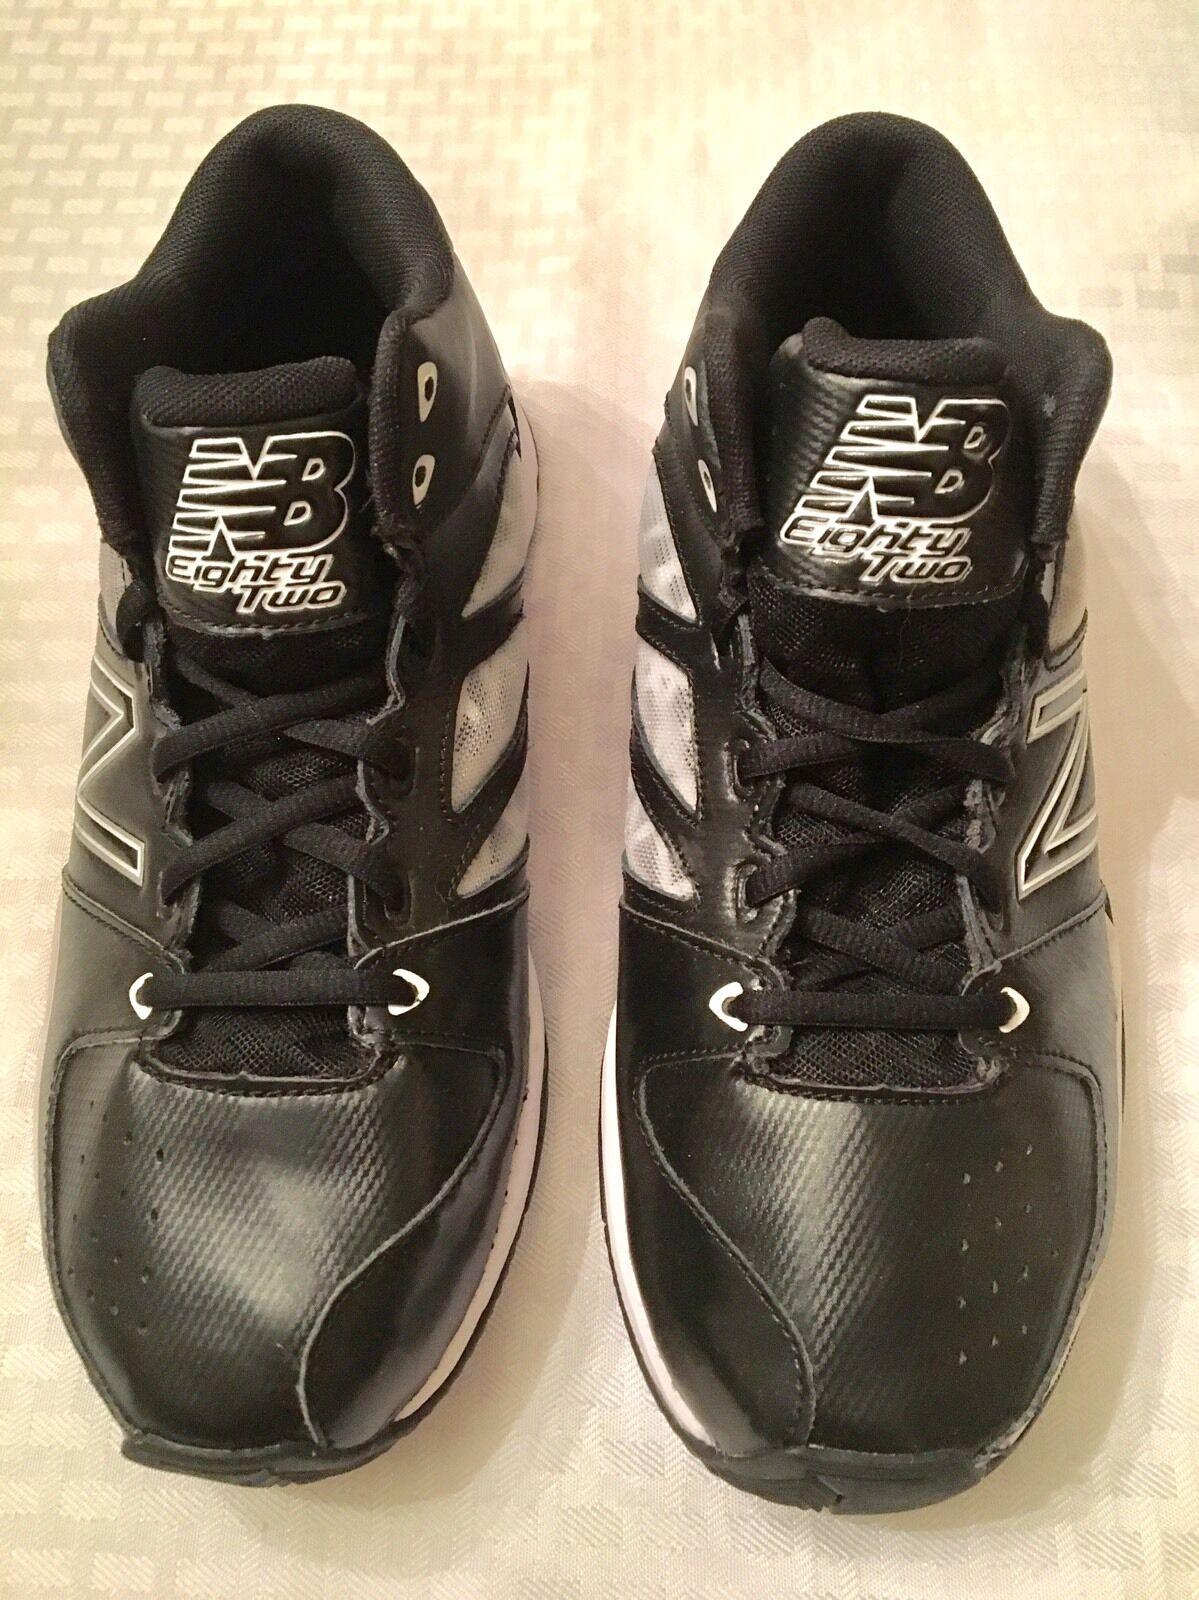 New Balance Boy's Round Toe Synthetic Basketball Shoe Size 6.5